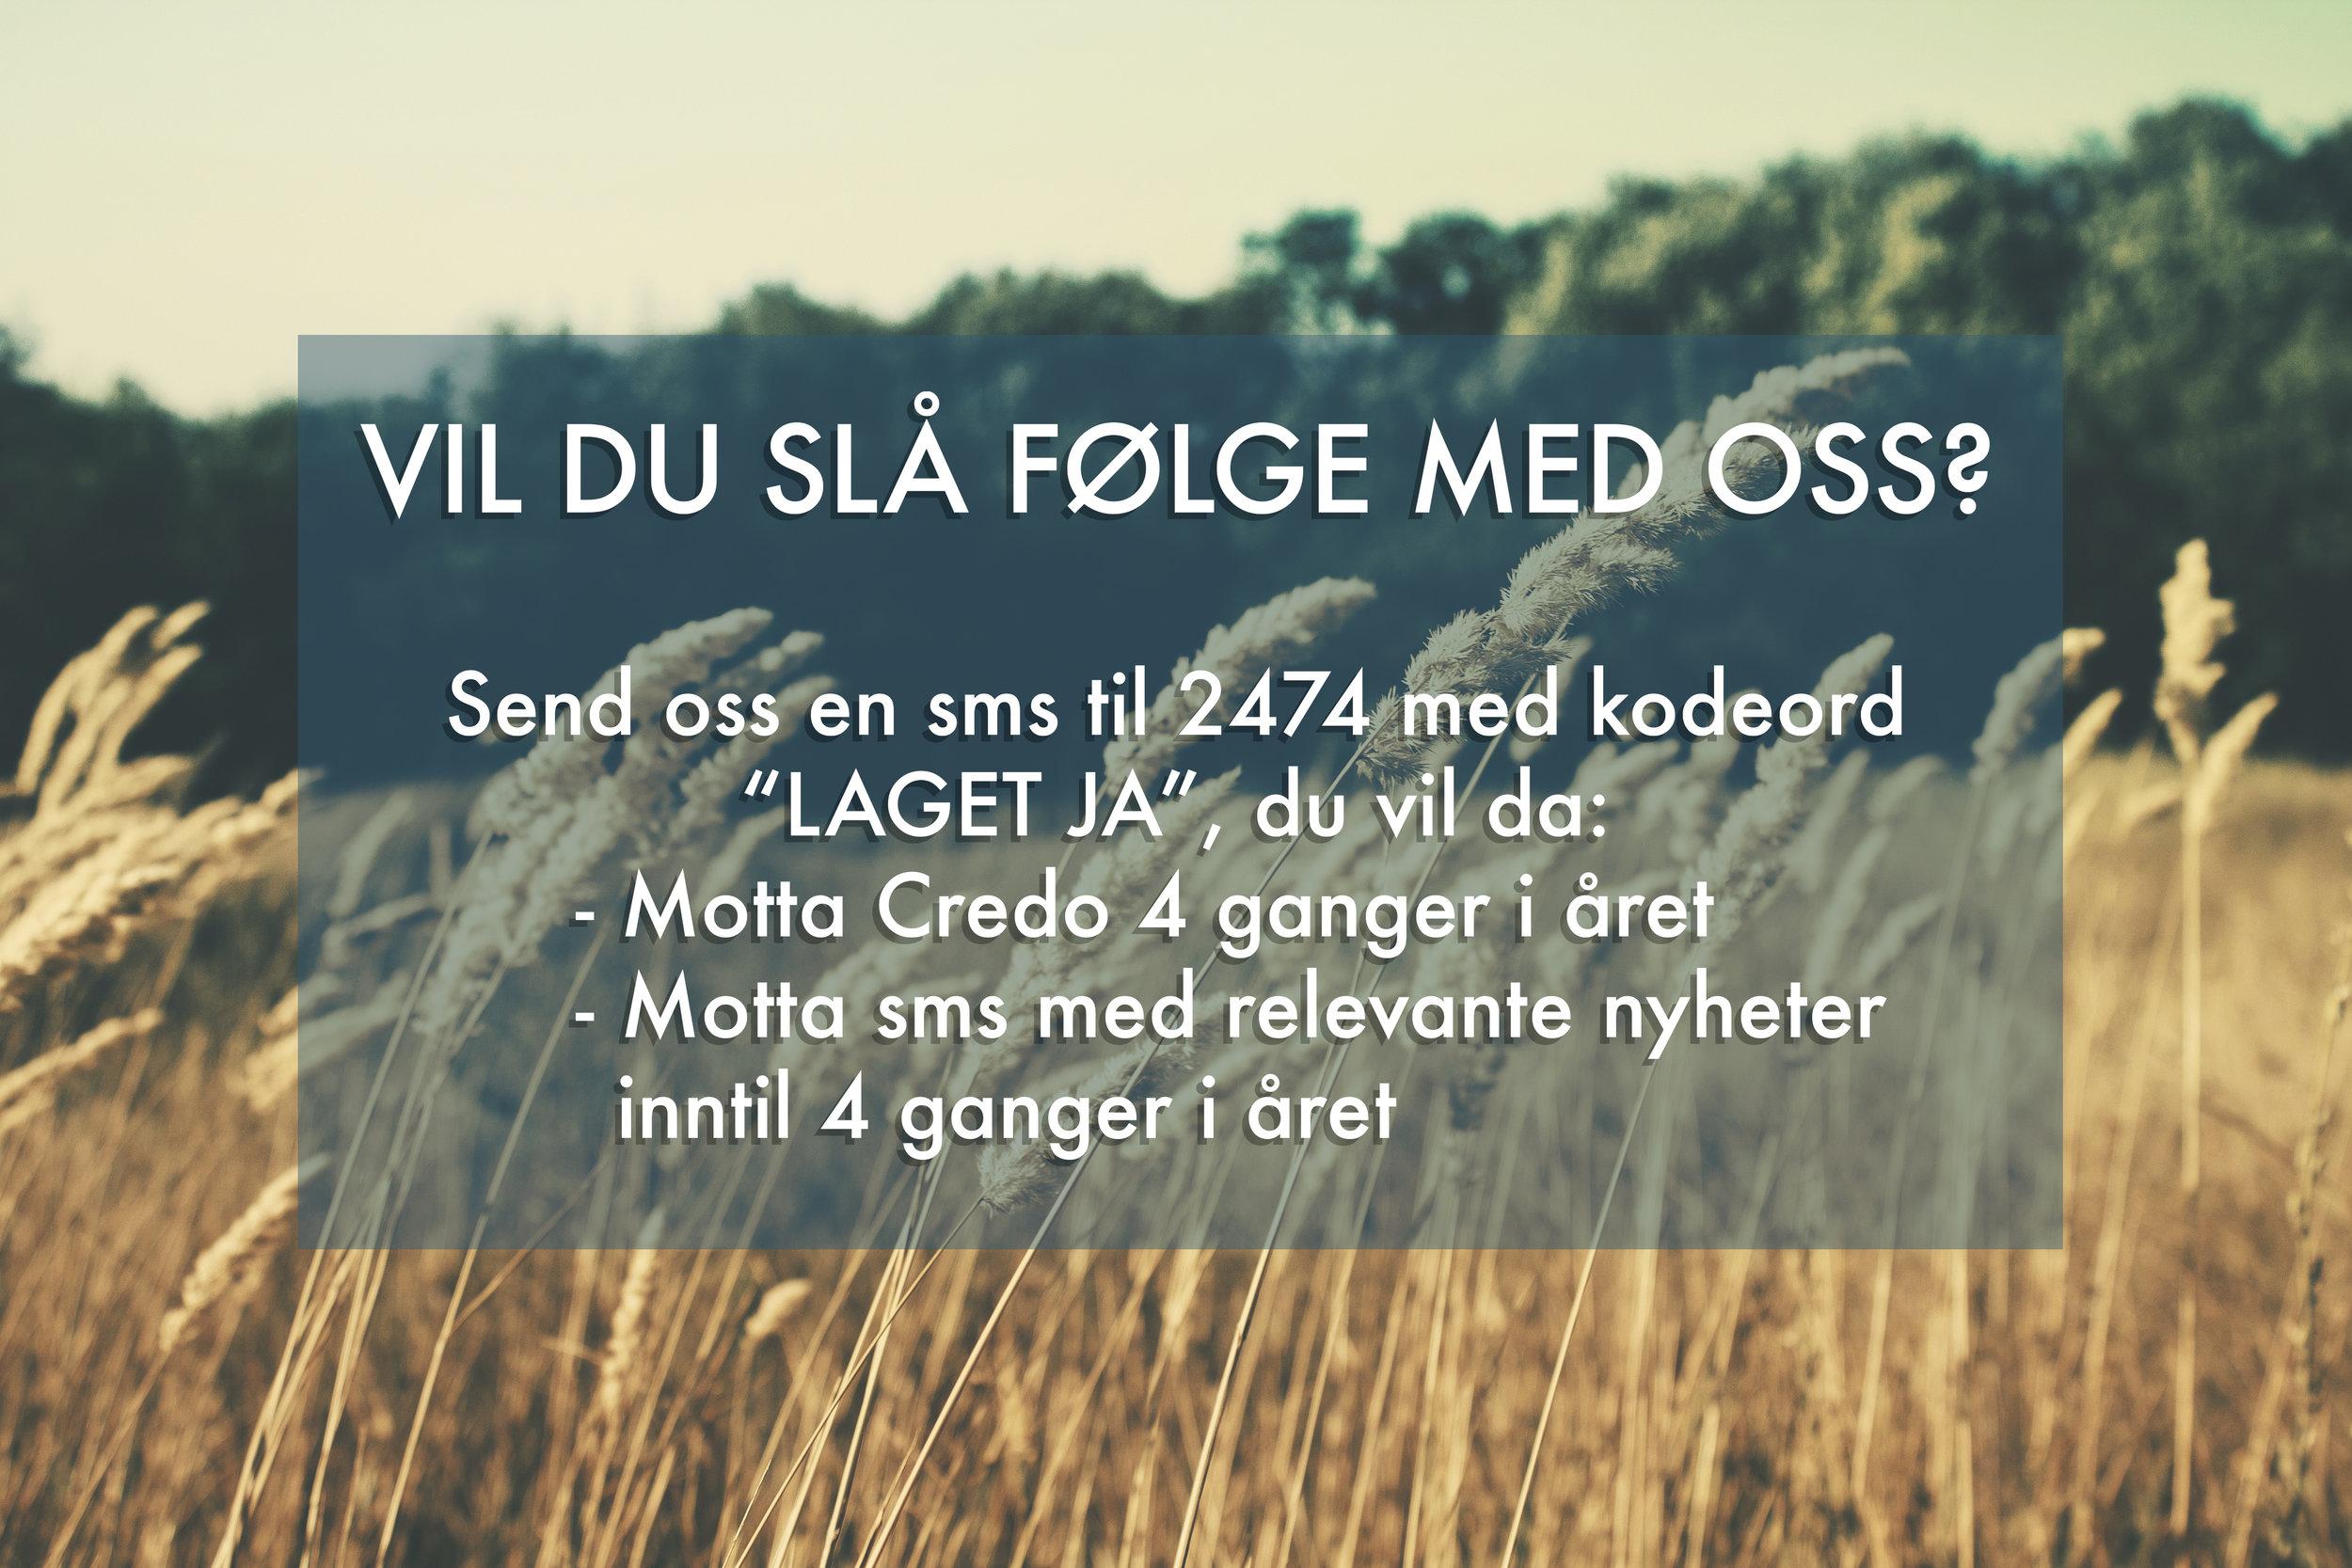 barley_folgmed.jpg